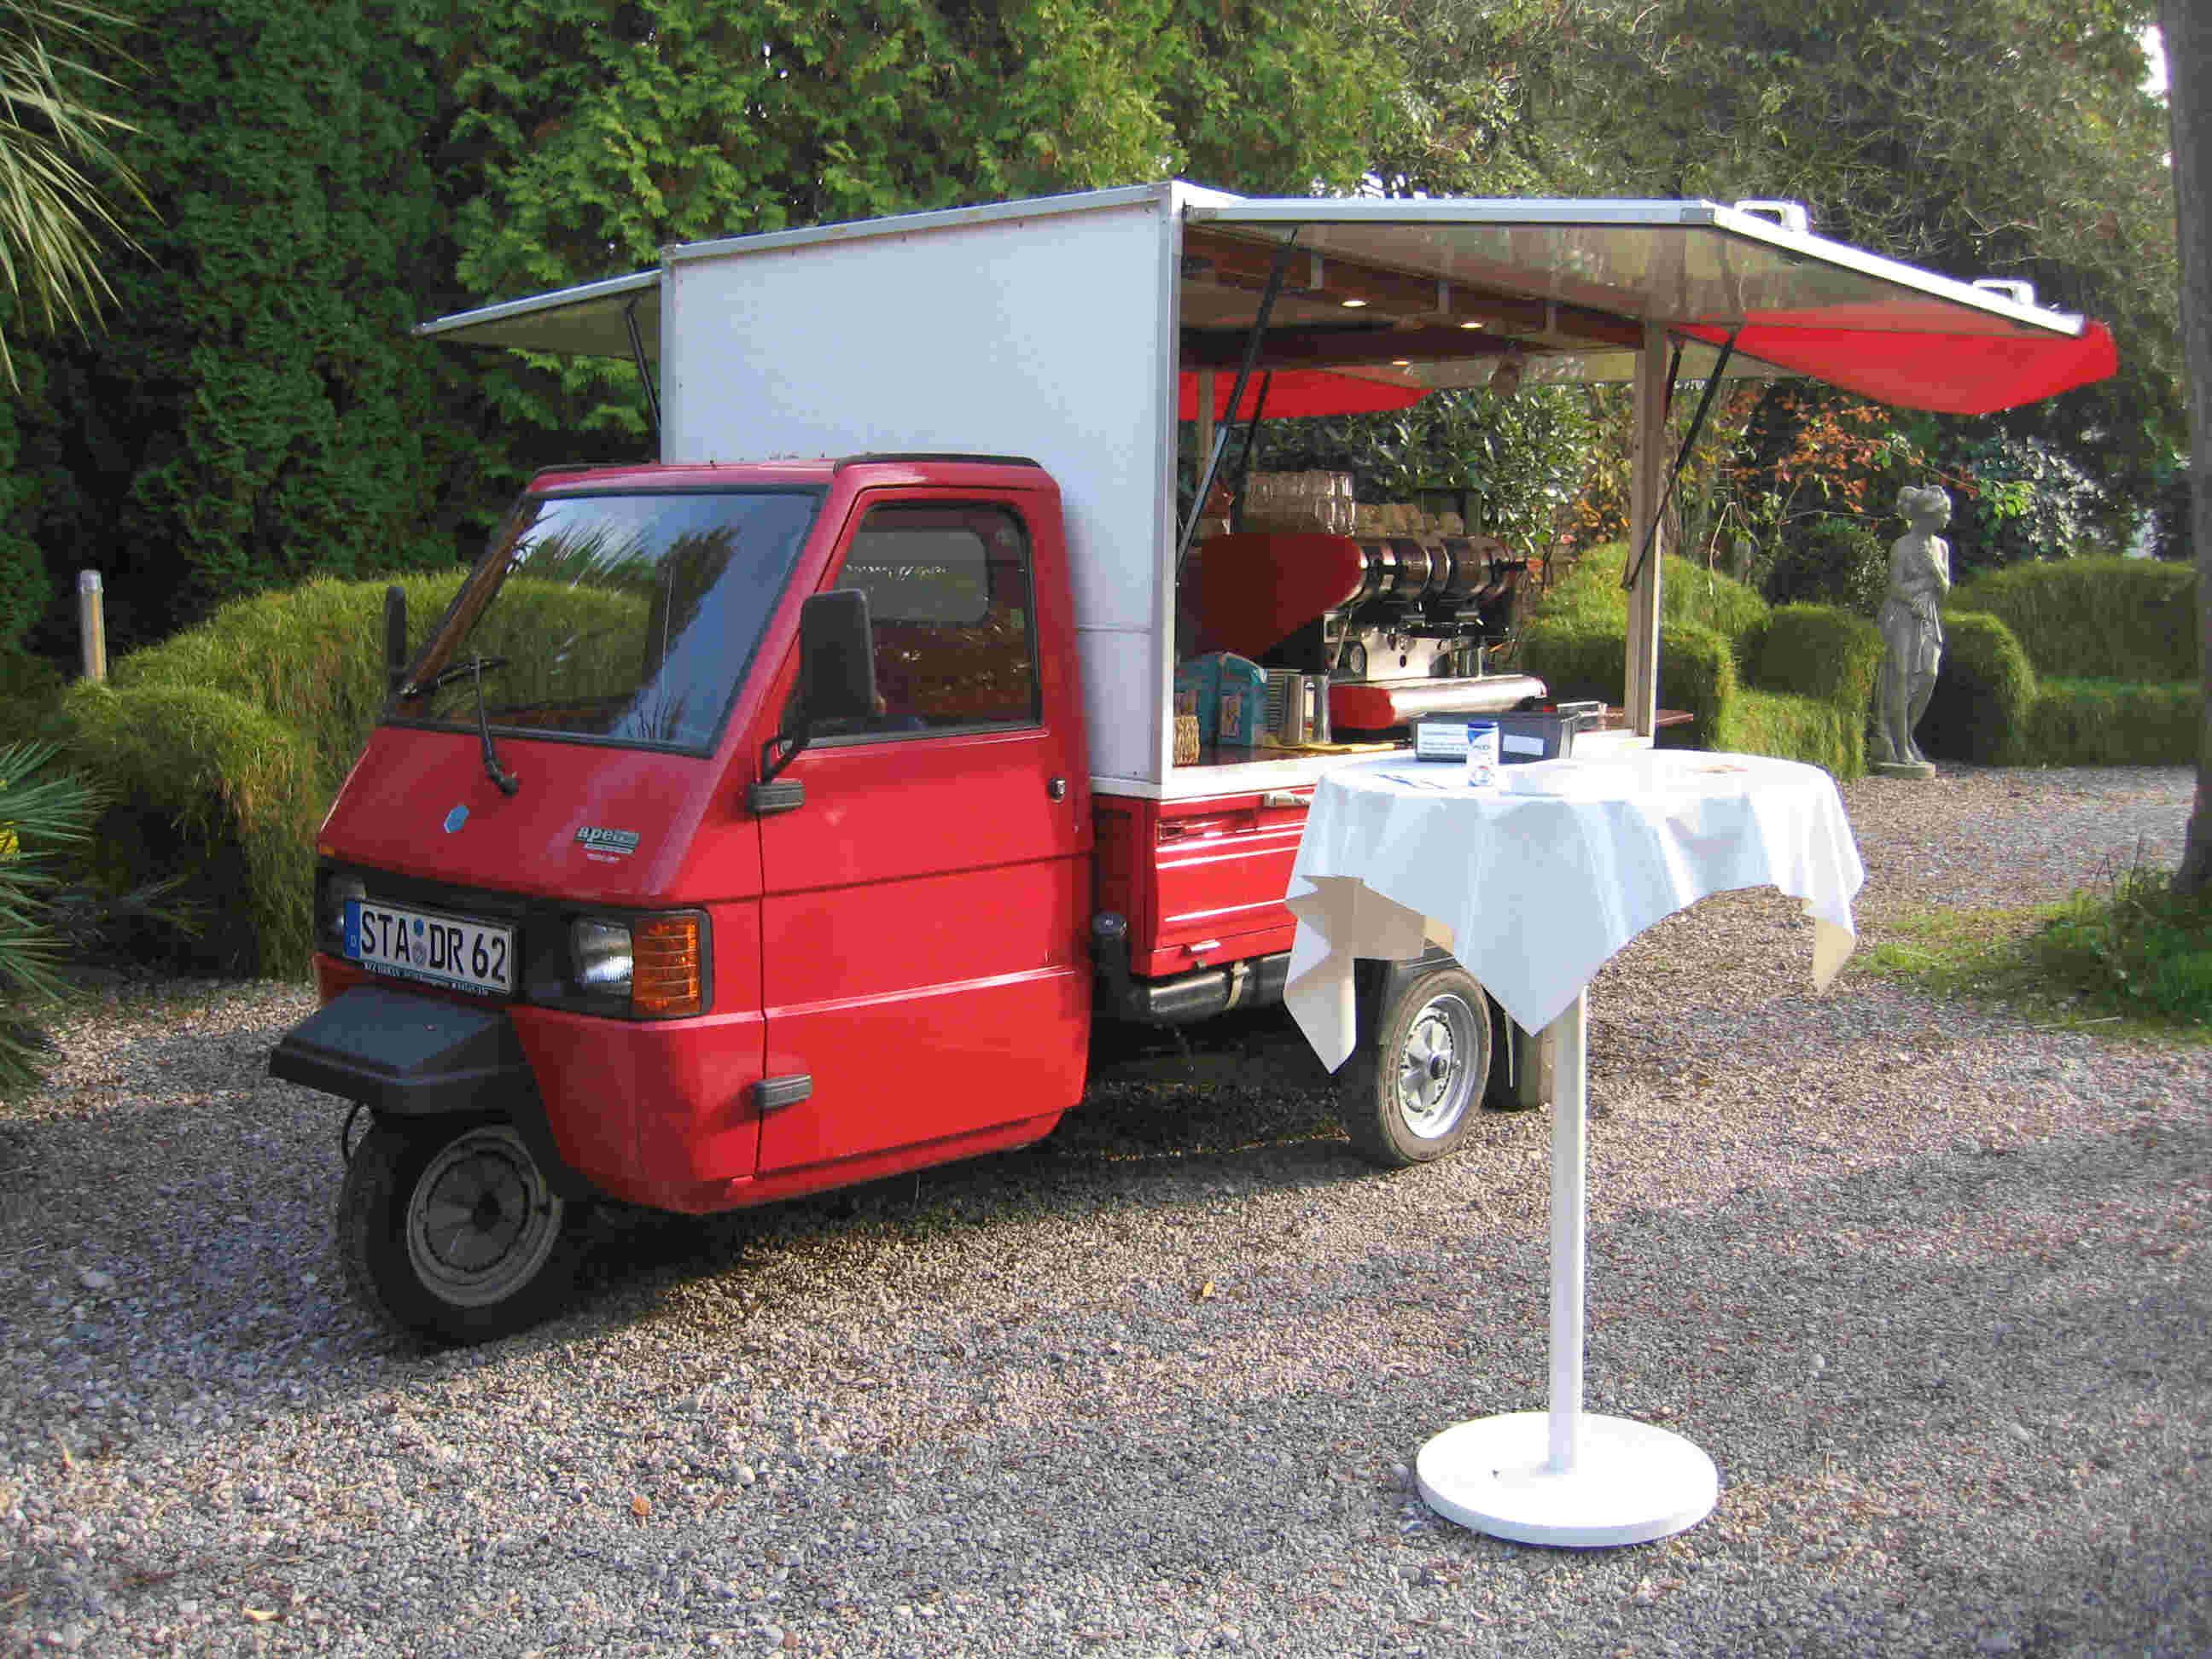 piaggio kaffeemobil kaufen motorrad bild idee. Black Bedroom Furniture Sets. Home Design Ideas